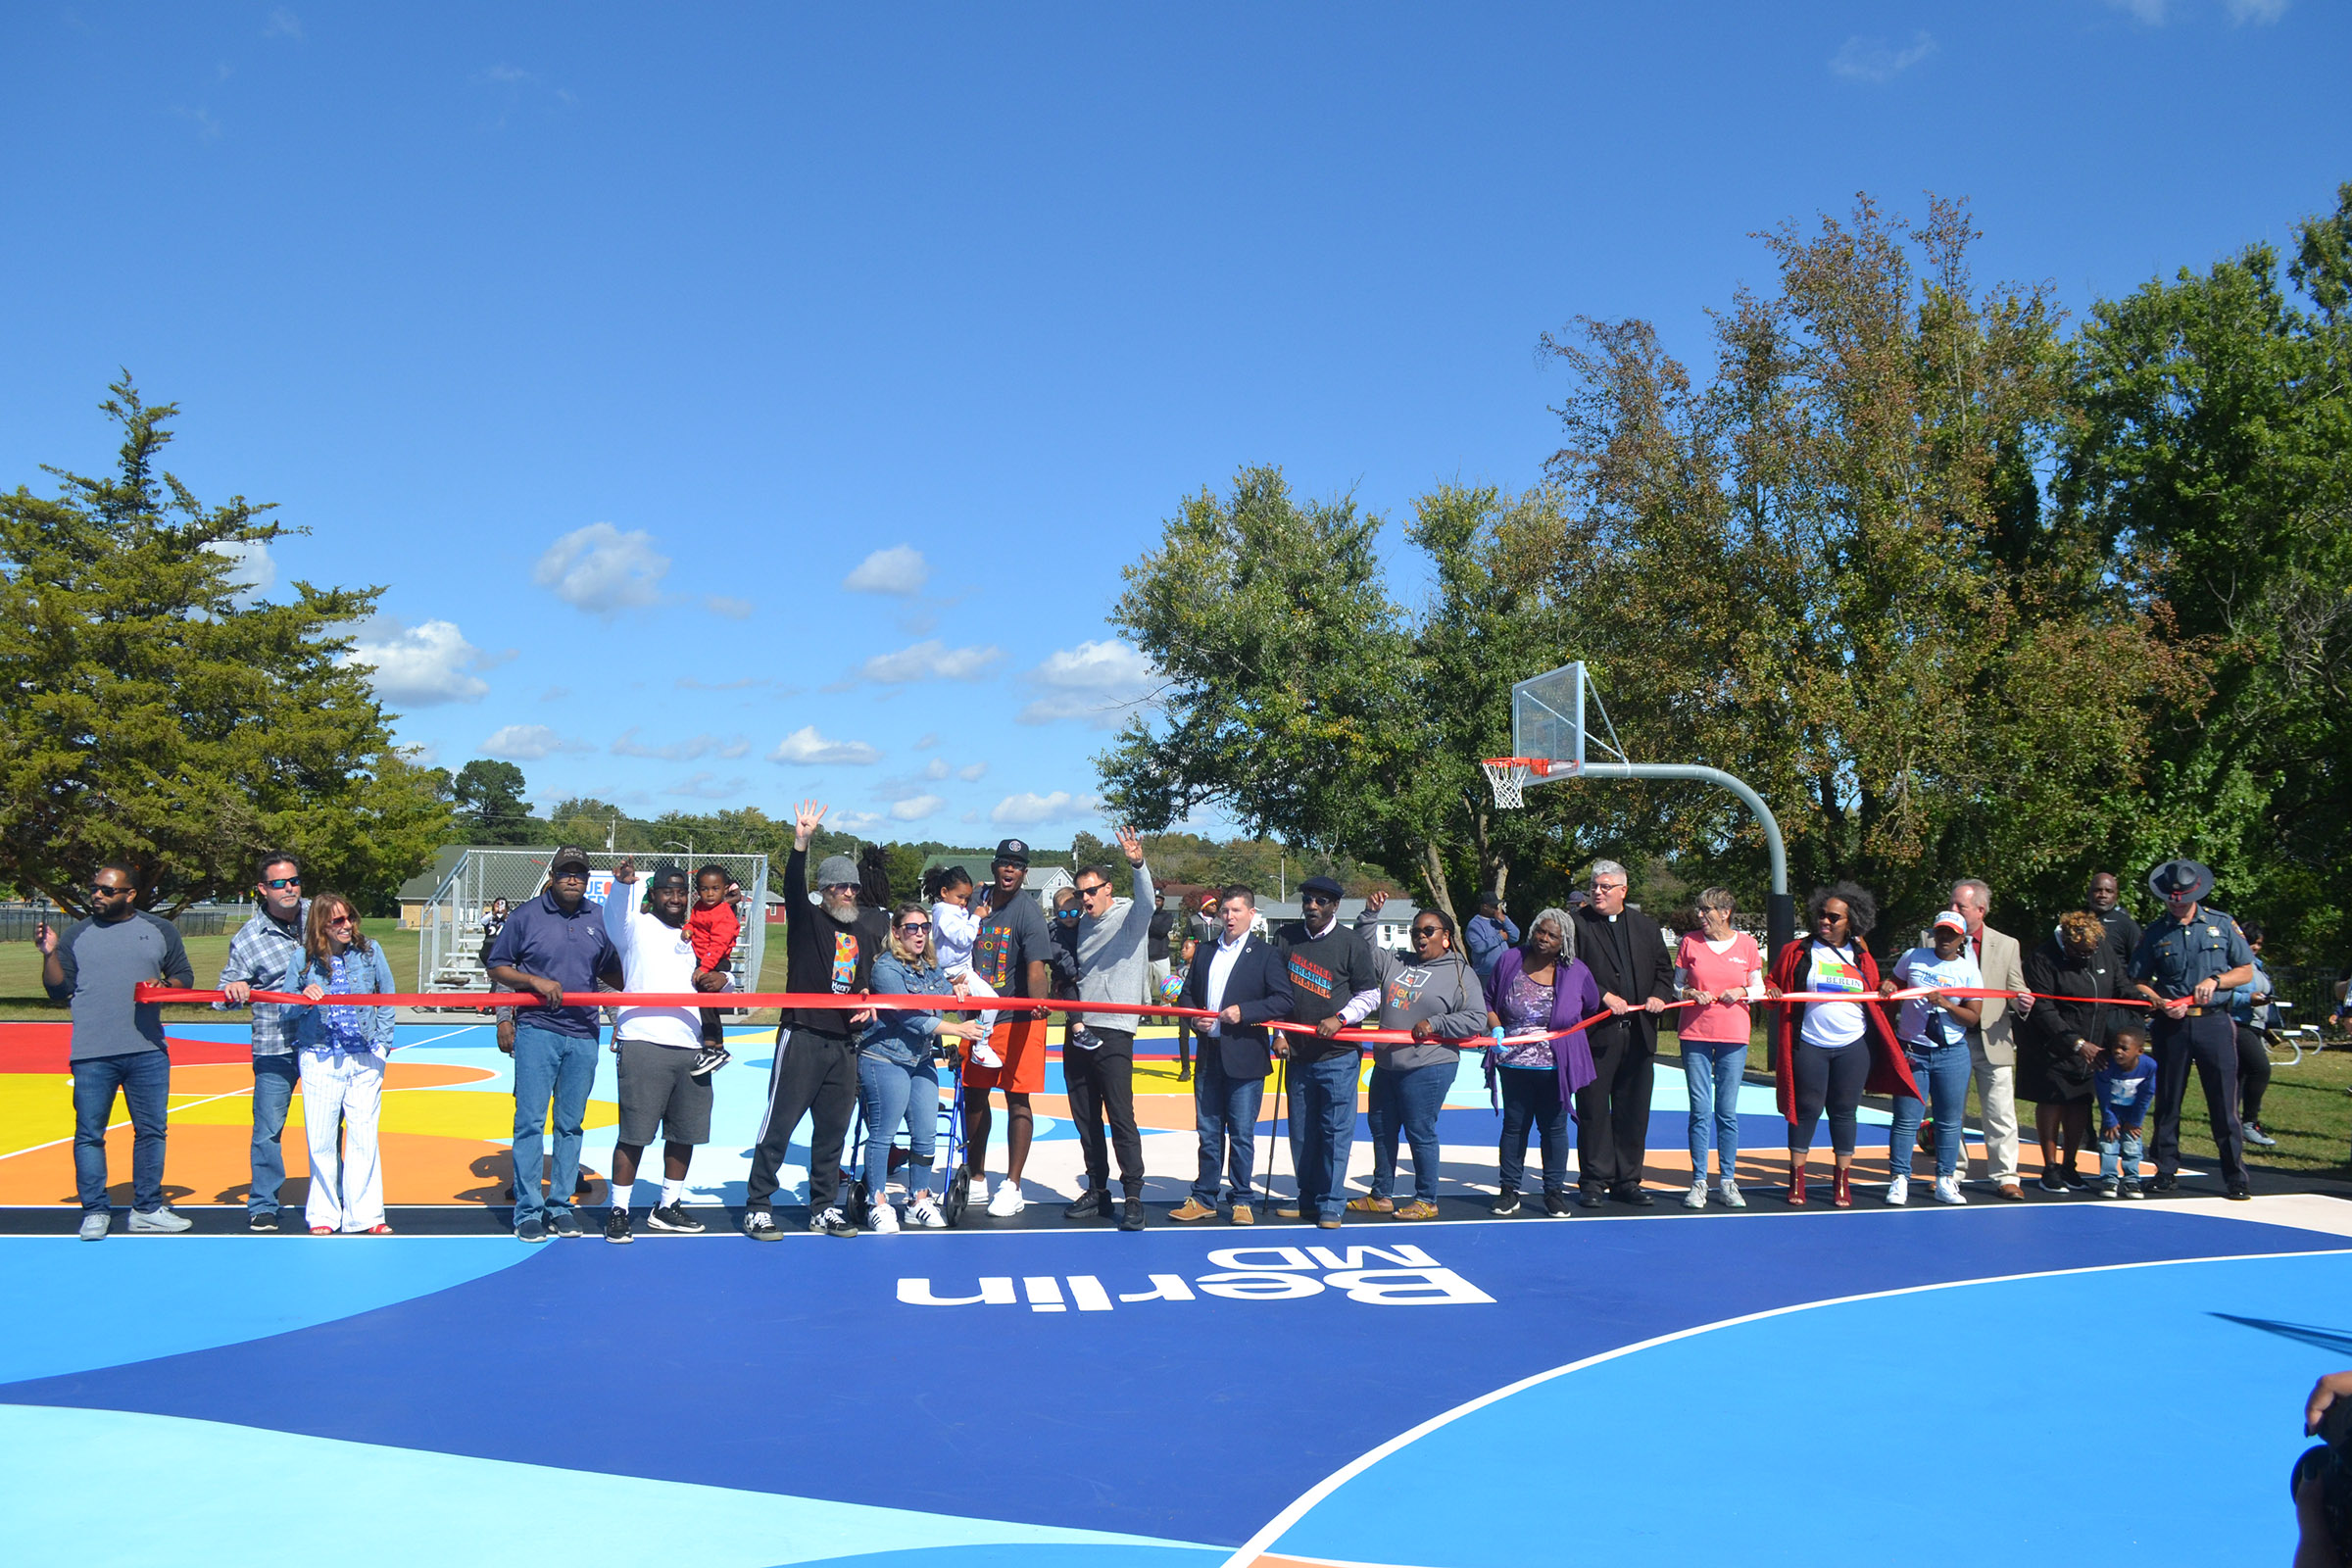 Community Celebrates Henry Park Overhaul, New Basketball Courts Mural